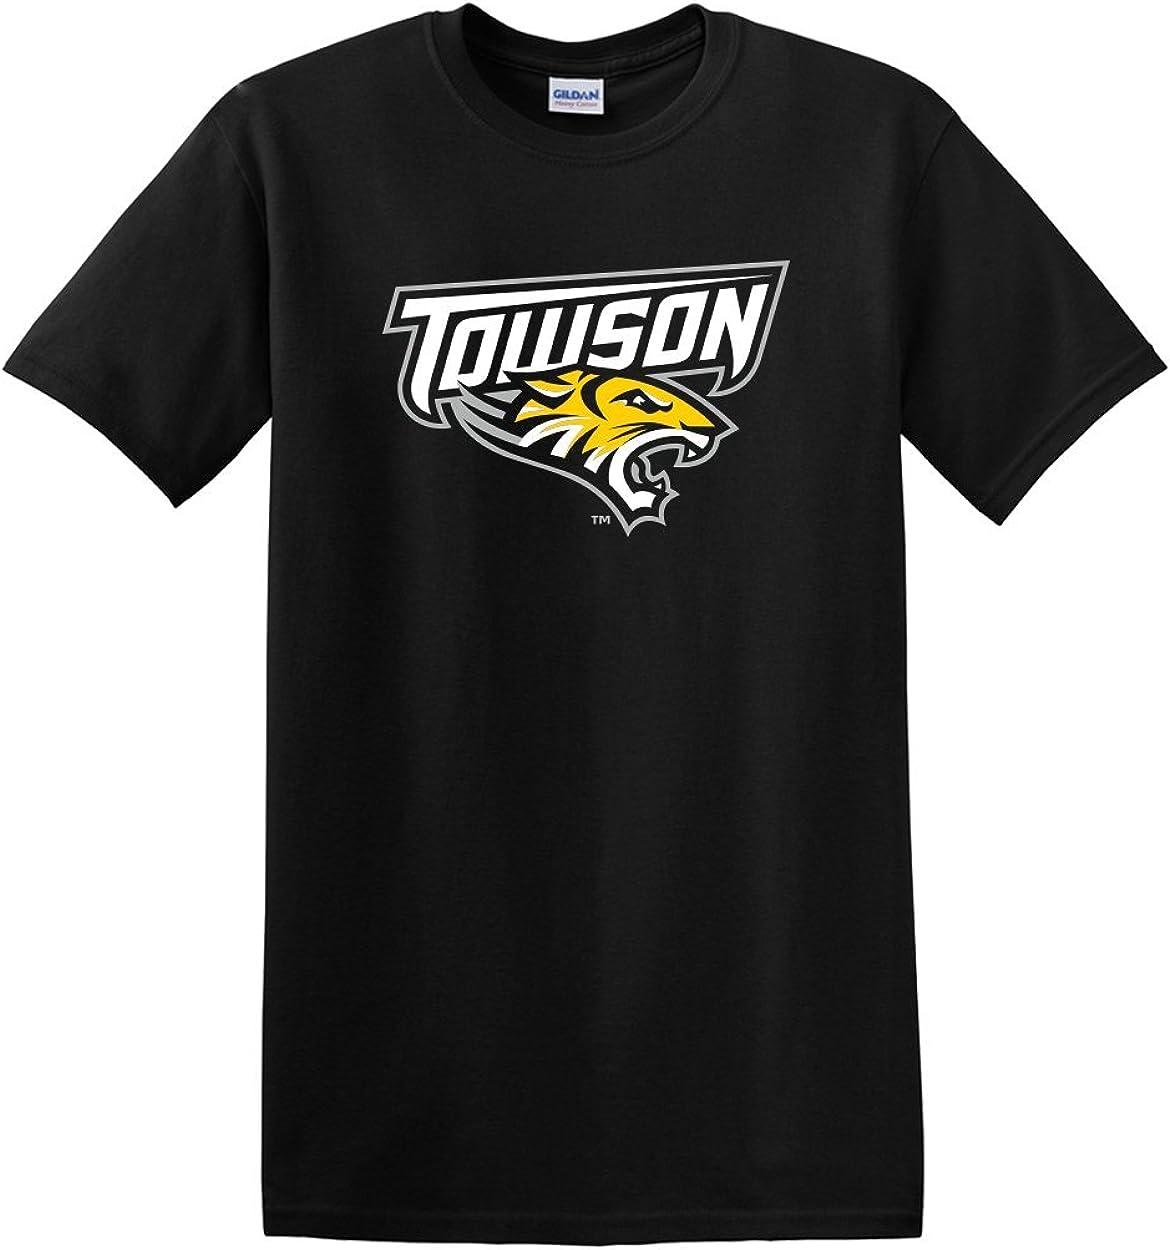 NCAA Towson Tigers T-Shirt V1